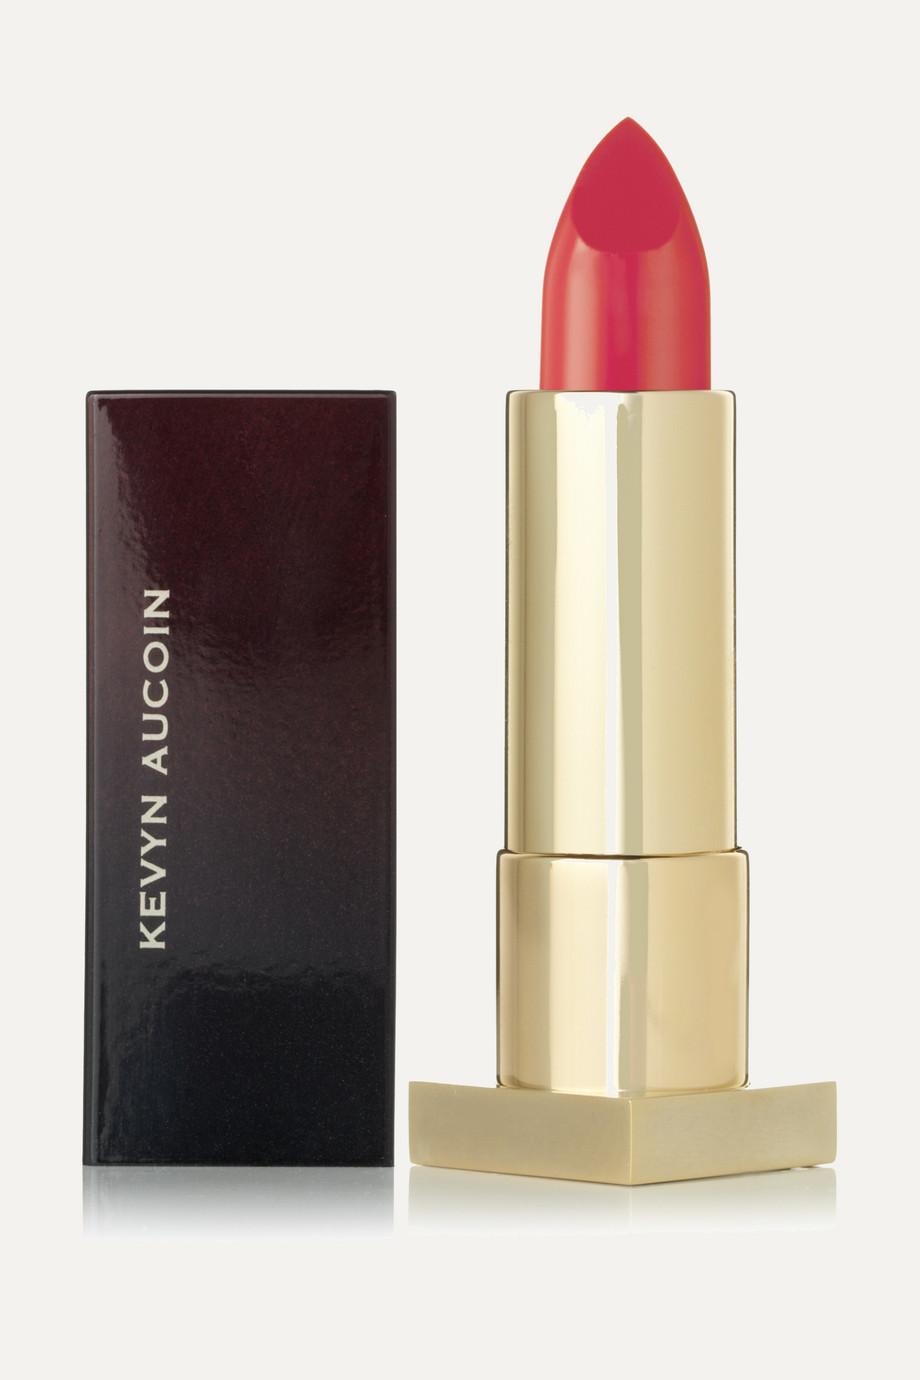 The Expert Lip Color - Yanilena, by Kevyn Aucoin